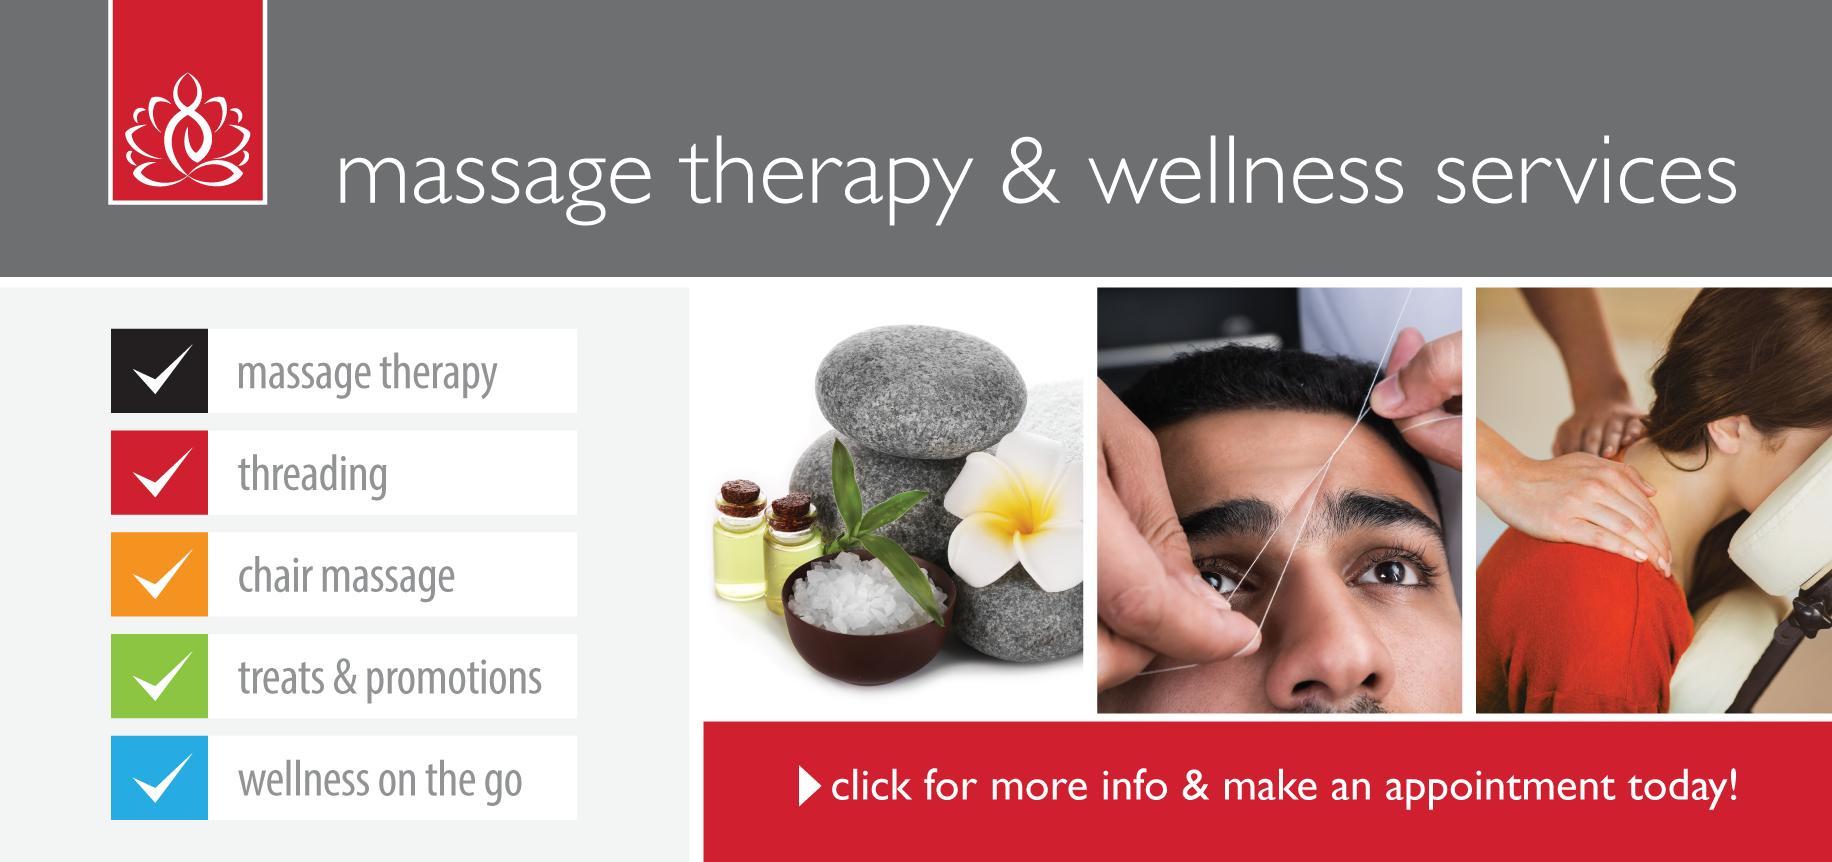 Rec_MsgTherapyWellness_WebBanner_F19_KP